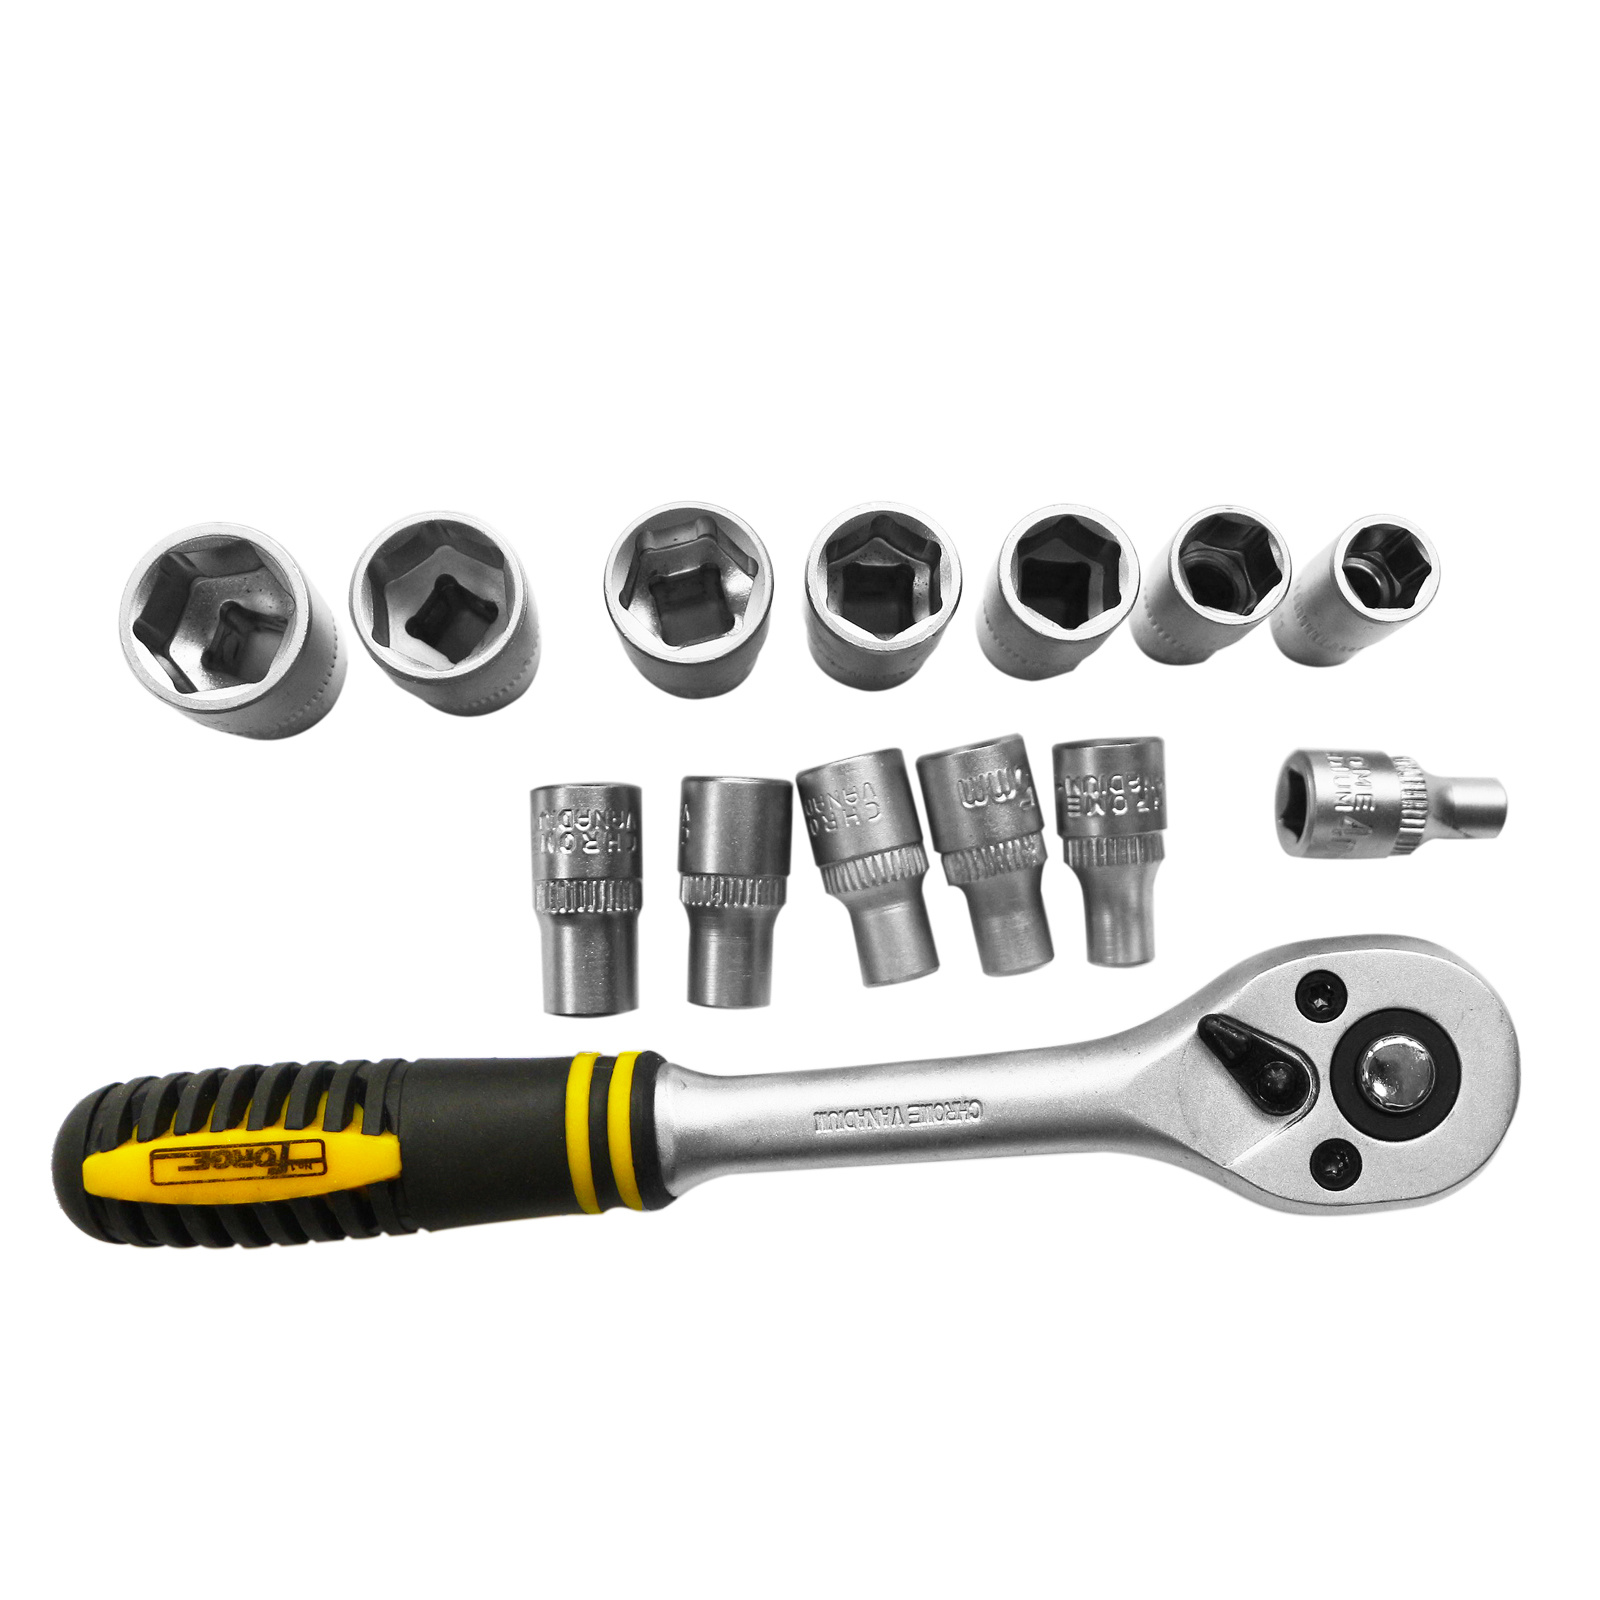 "Hand Tools 11PCS Cr-V Steel Satin Chrome Plated 1/2"" Drive Socket Set"